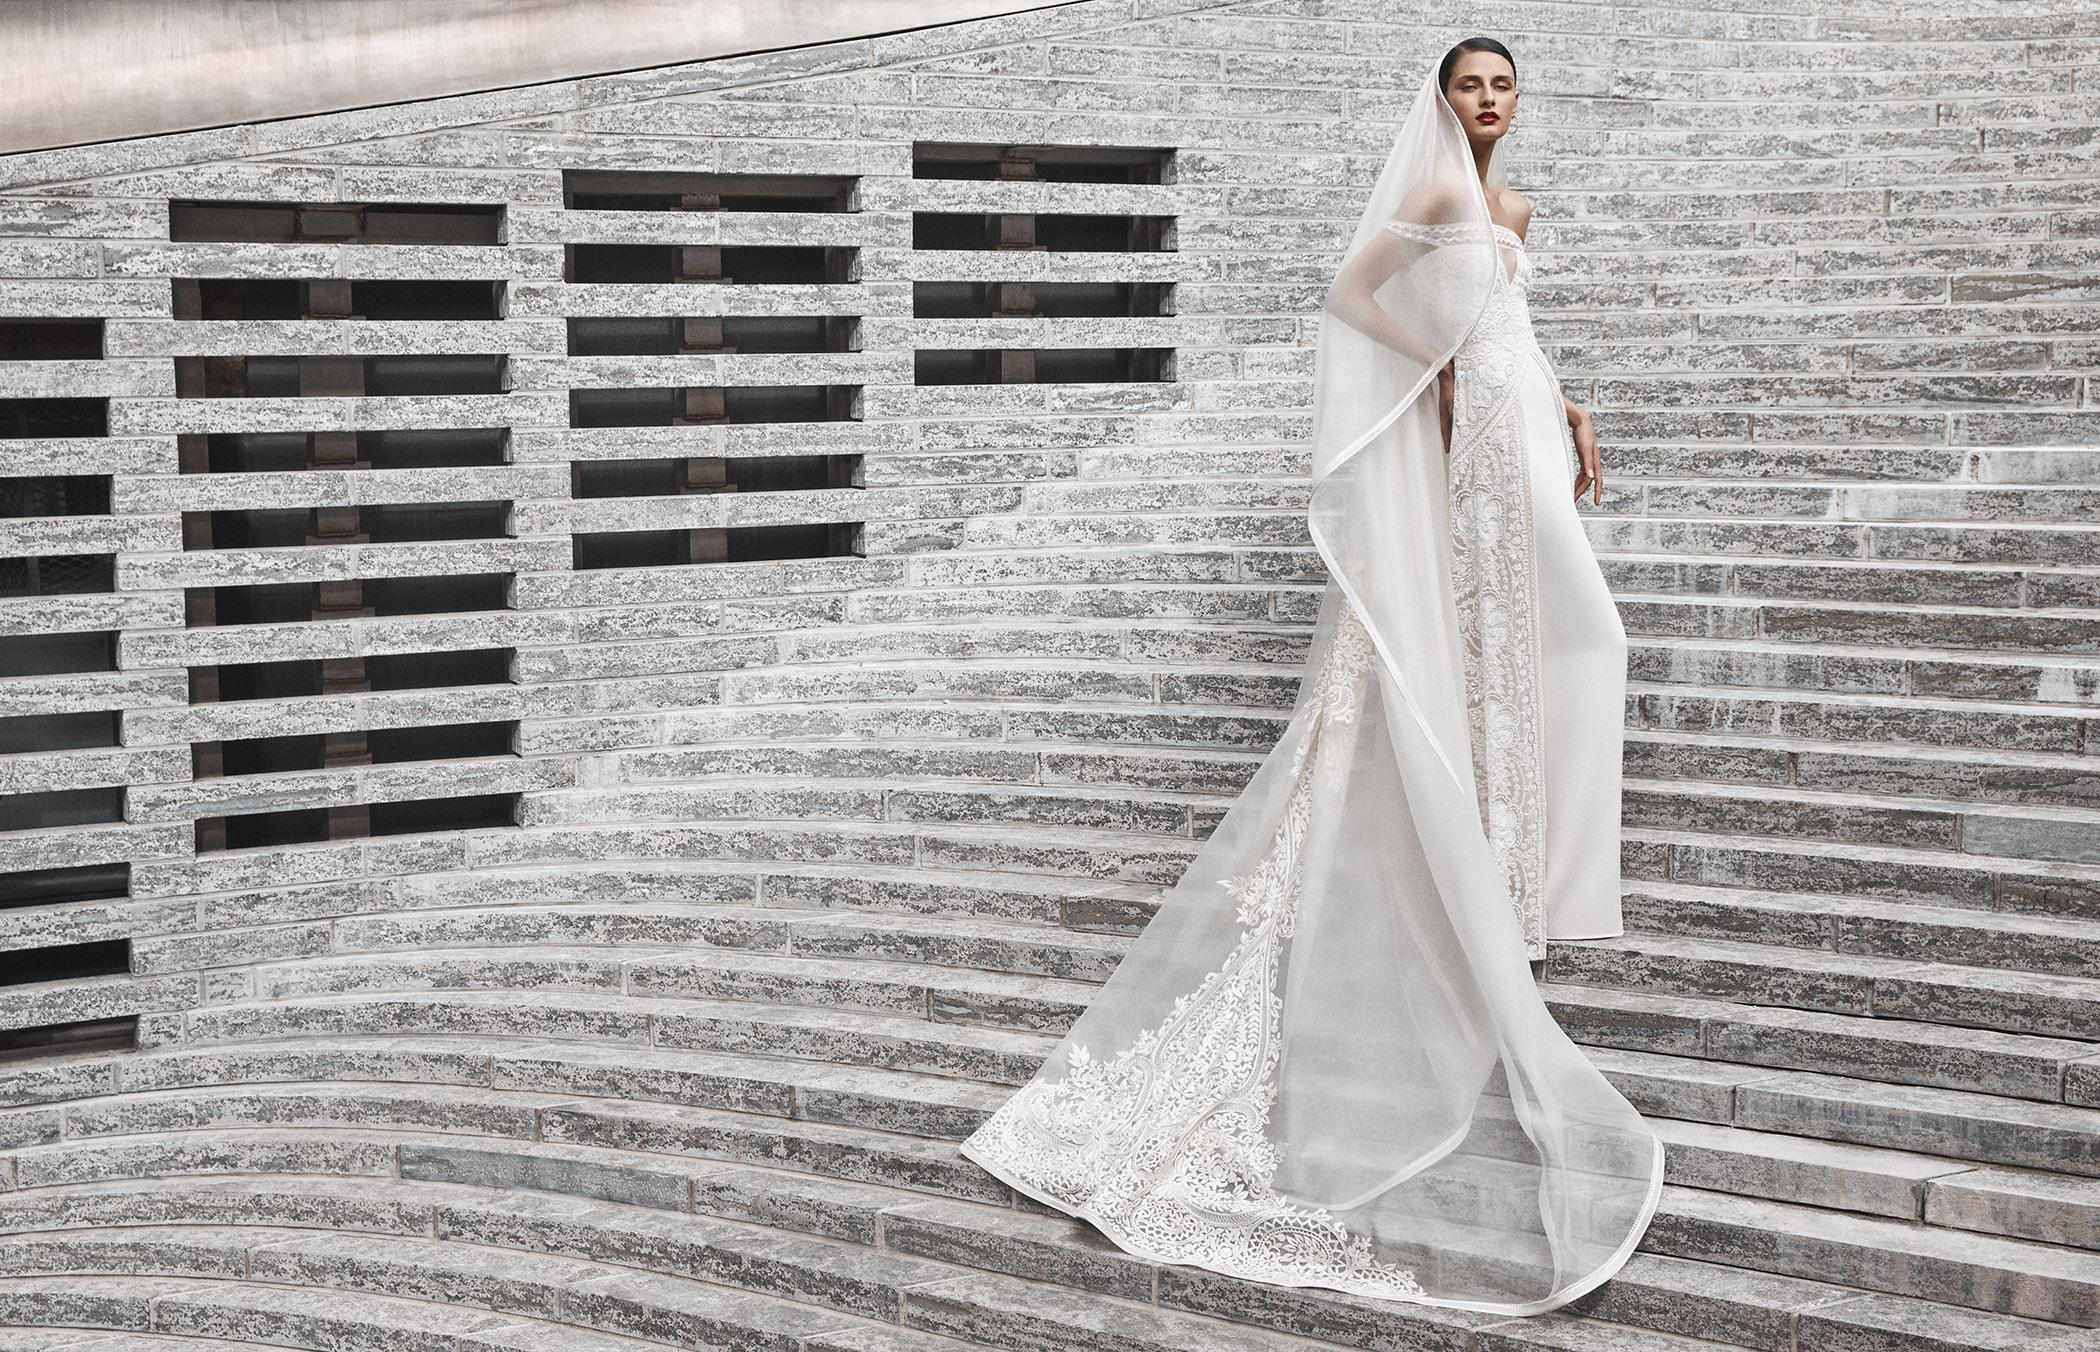 naeem khan wedding dress off the shoulder sheath lace panels on dress and veil